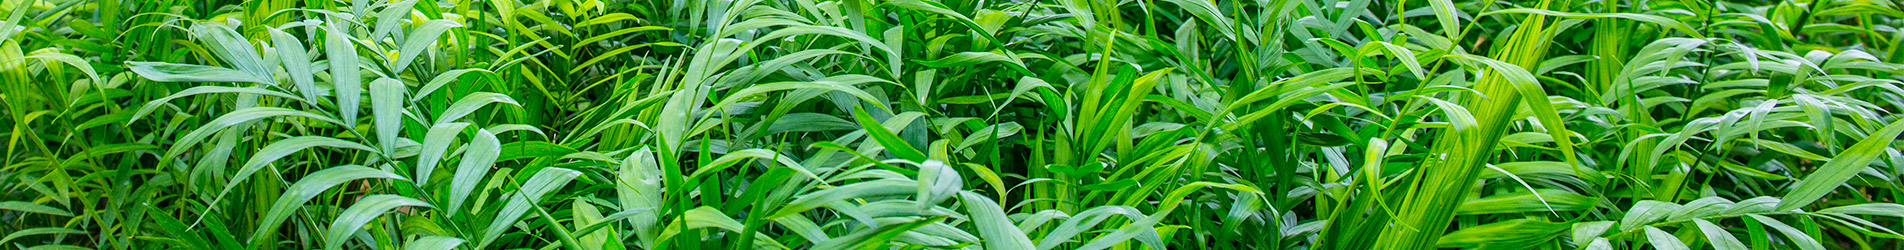 Detalle de plantas Chamaedoerea Elegans